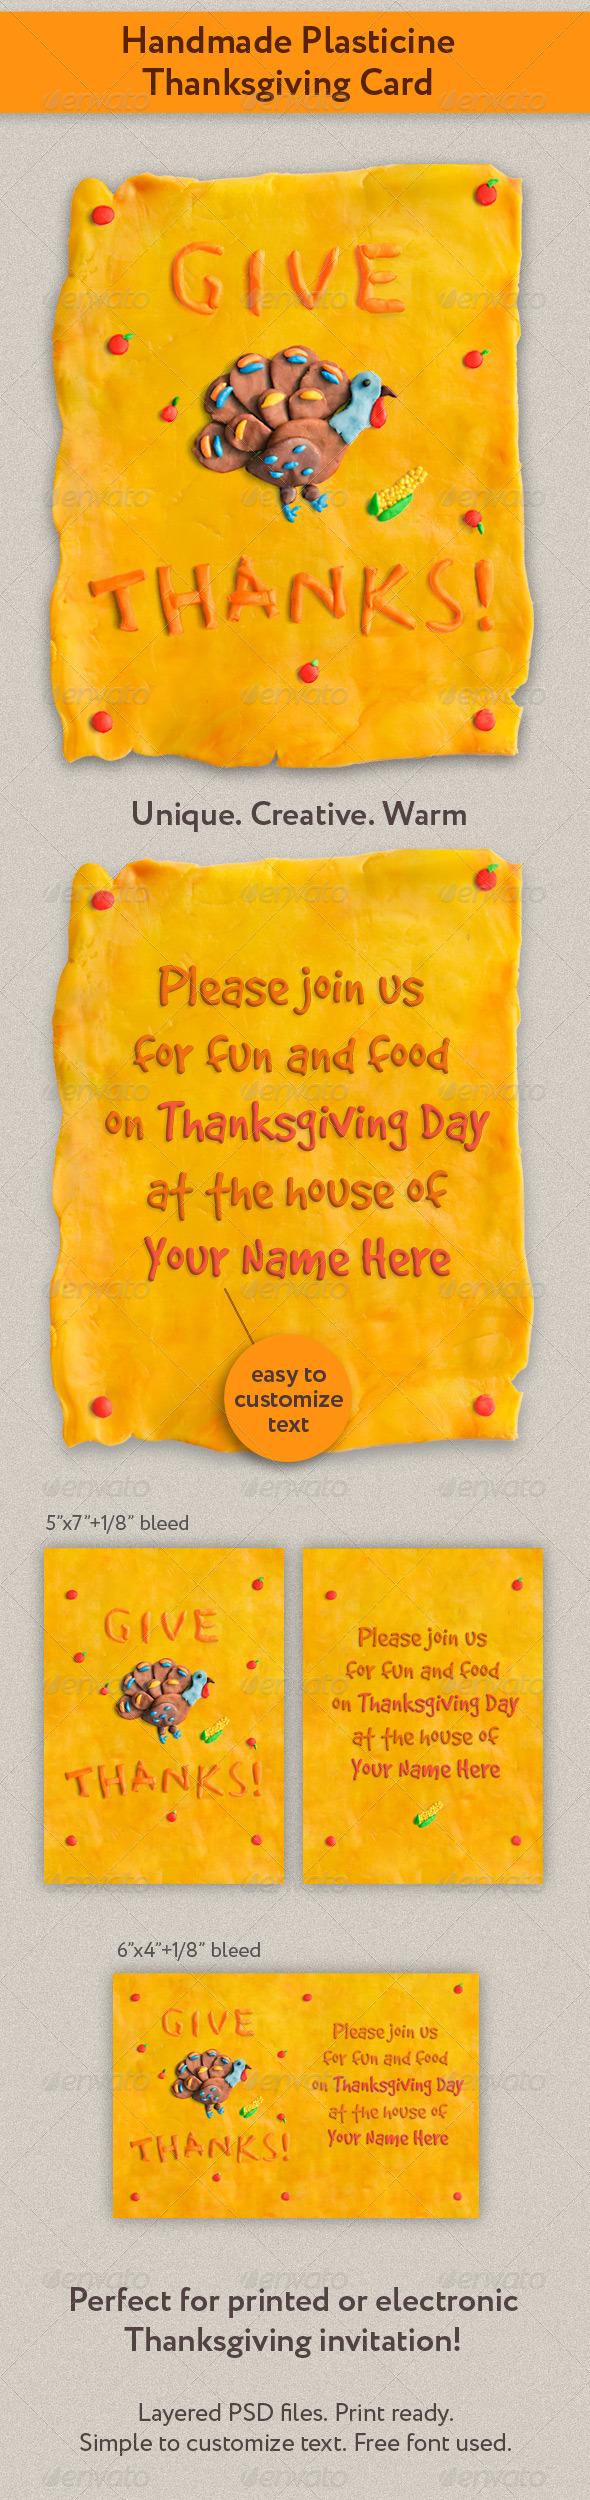 Handmade Plasticine Thanksgiving Card